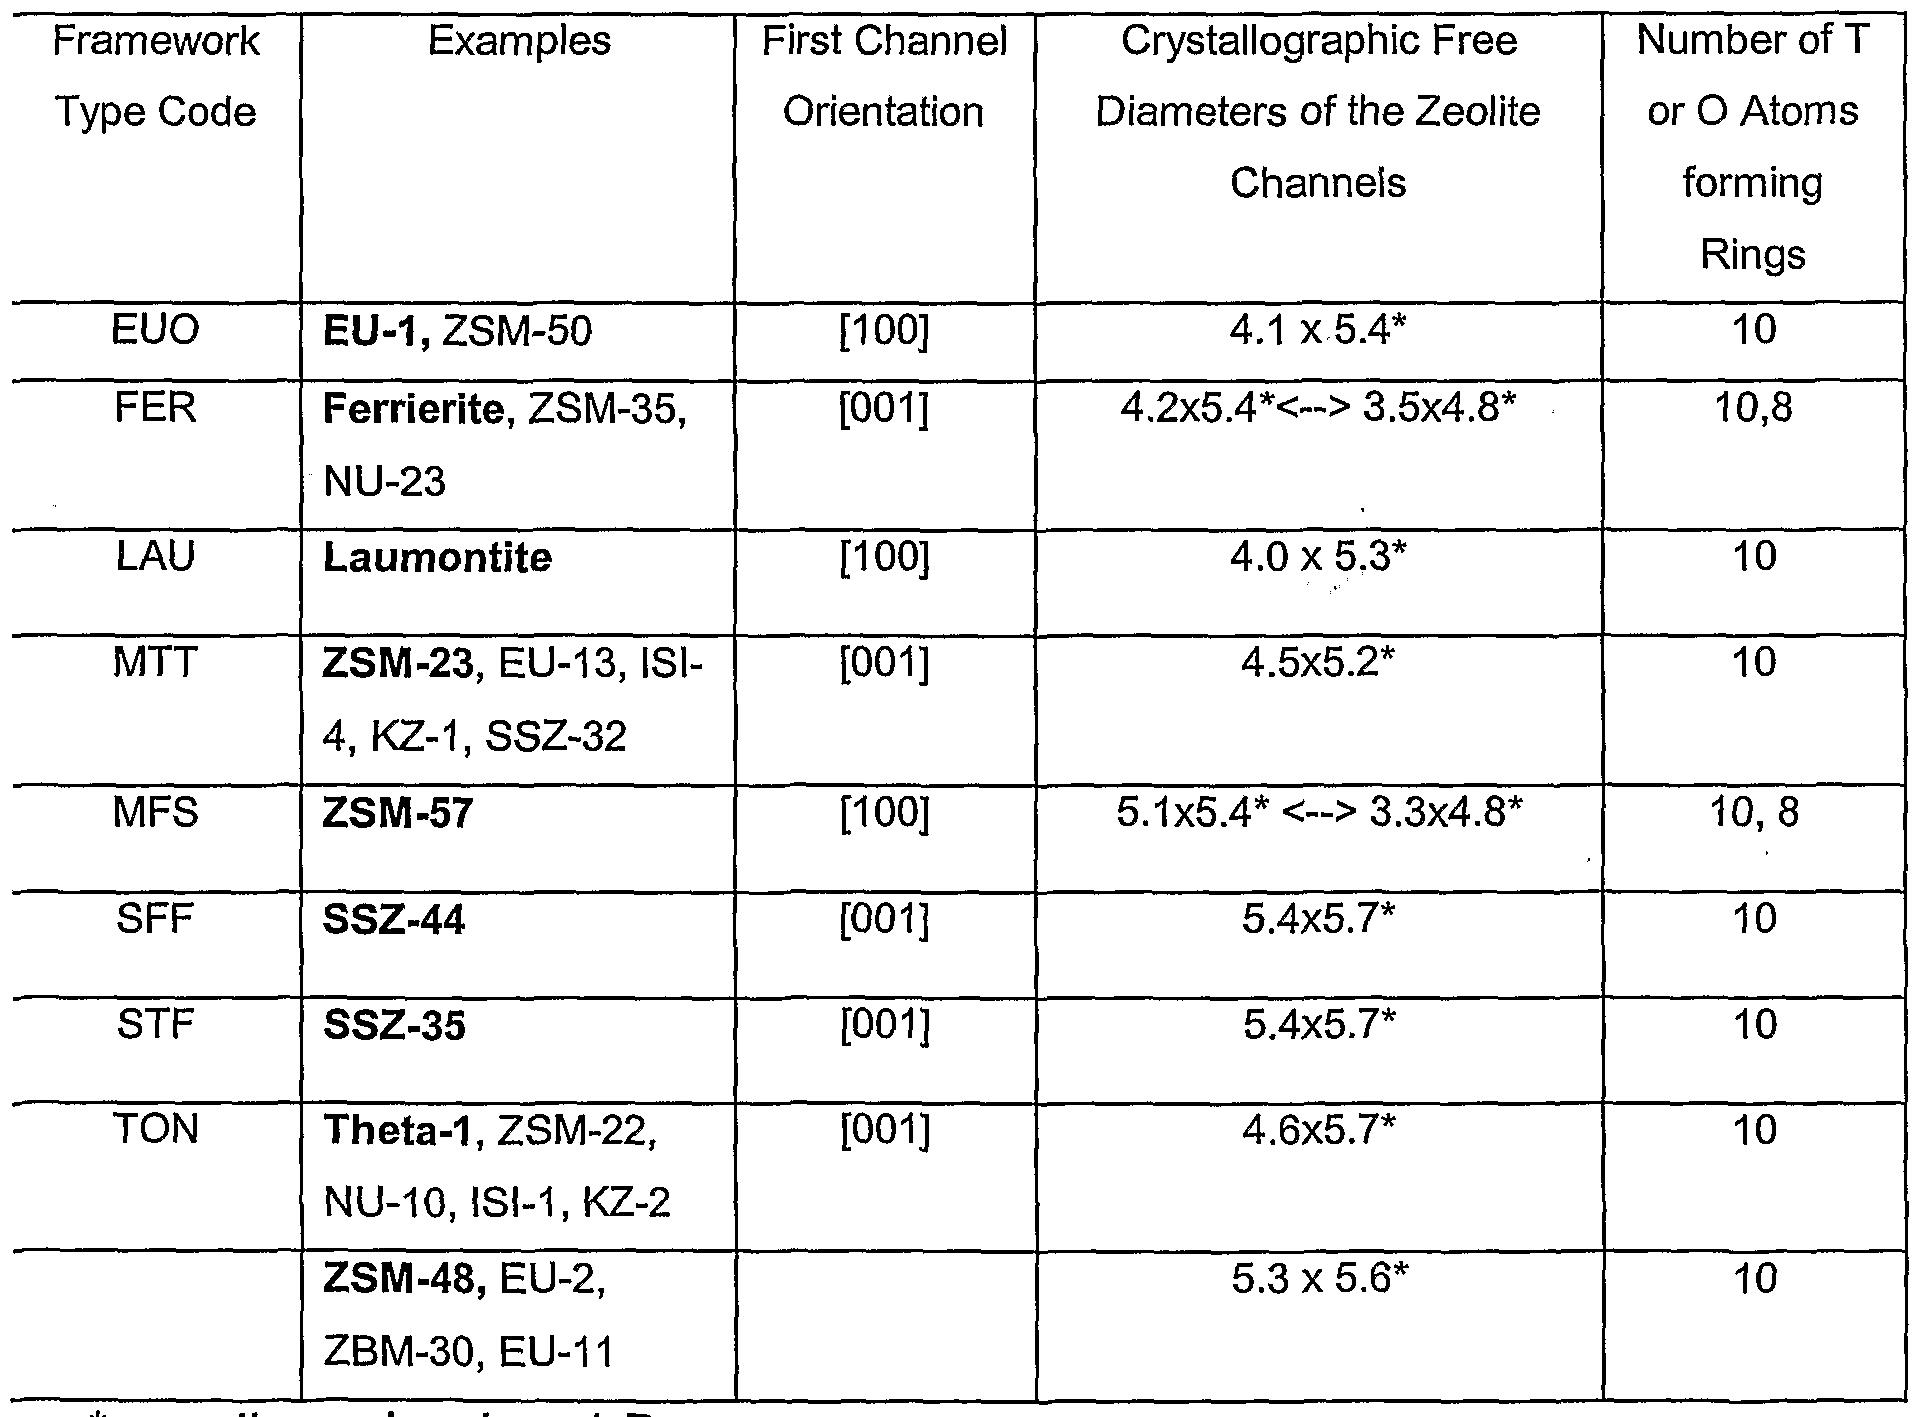 molecular weight definition example essays